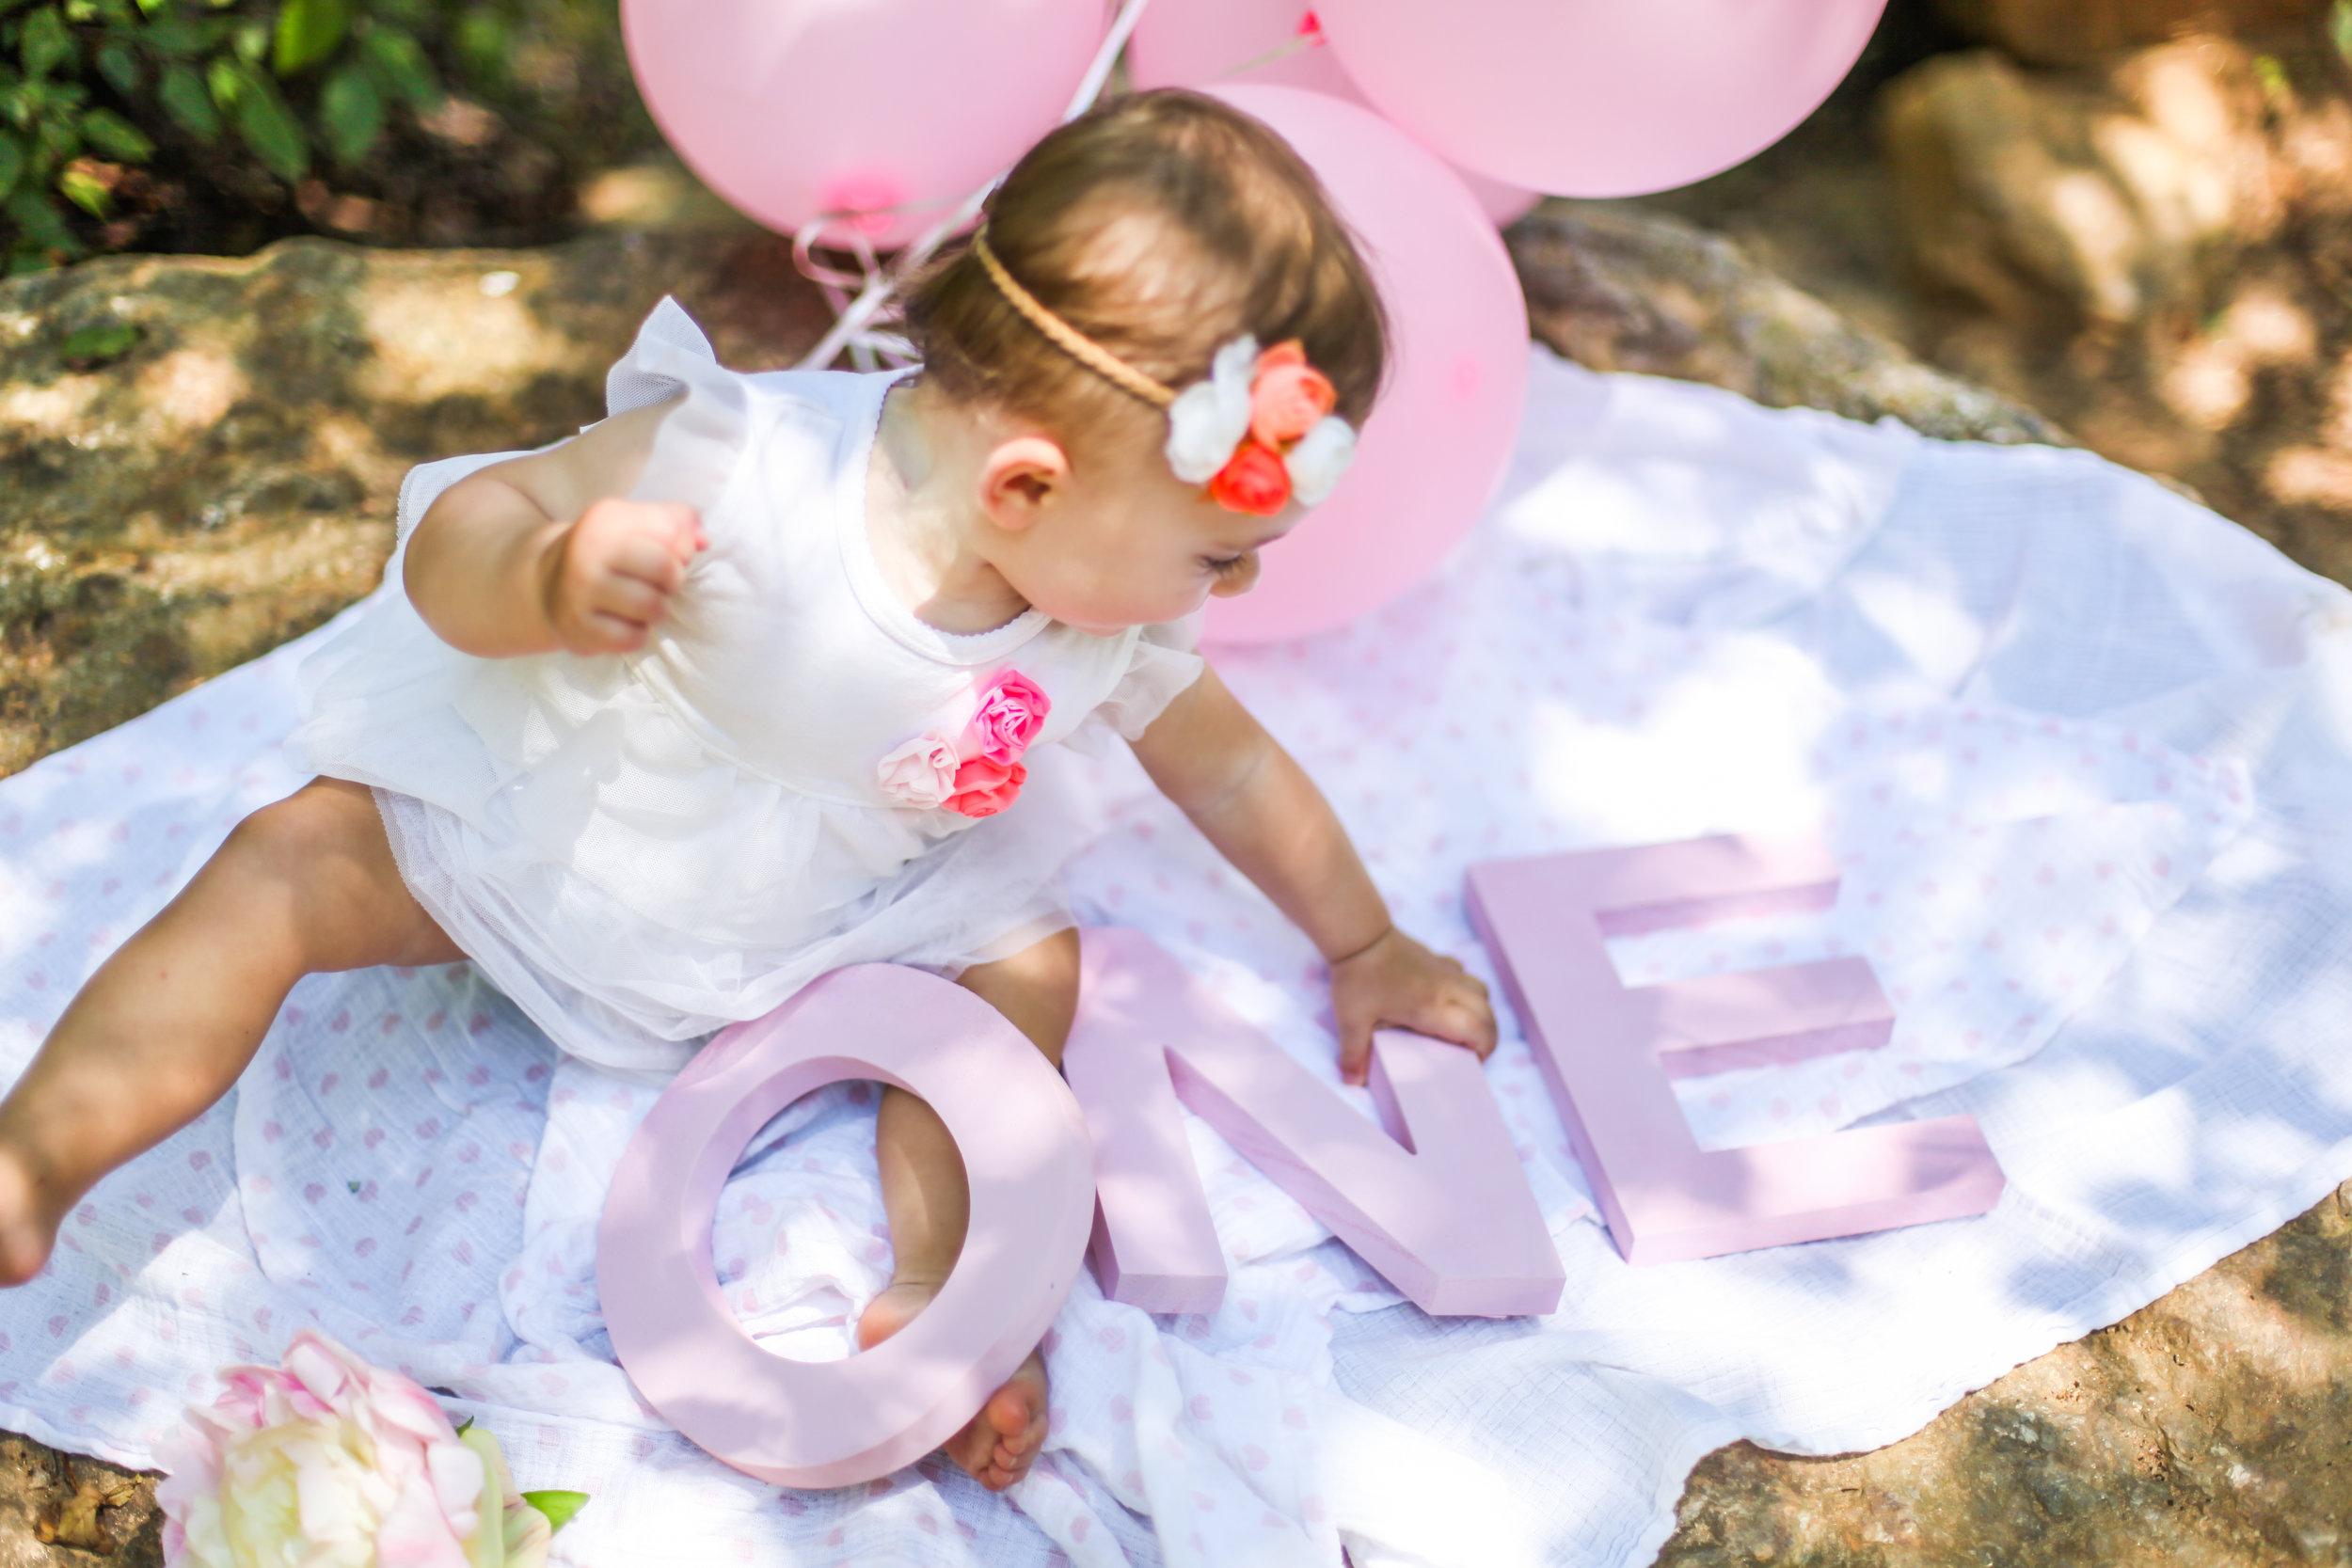 woodstock baby photography angela elliott-81.jpg